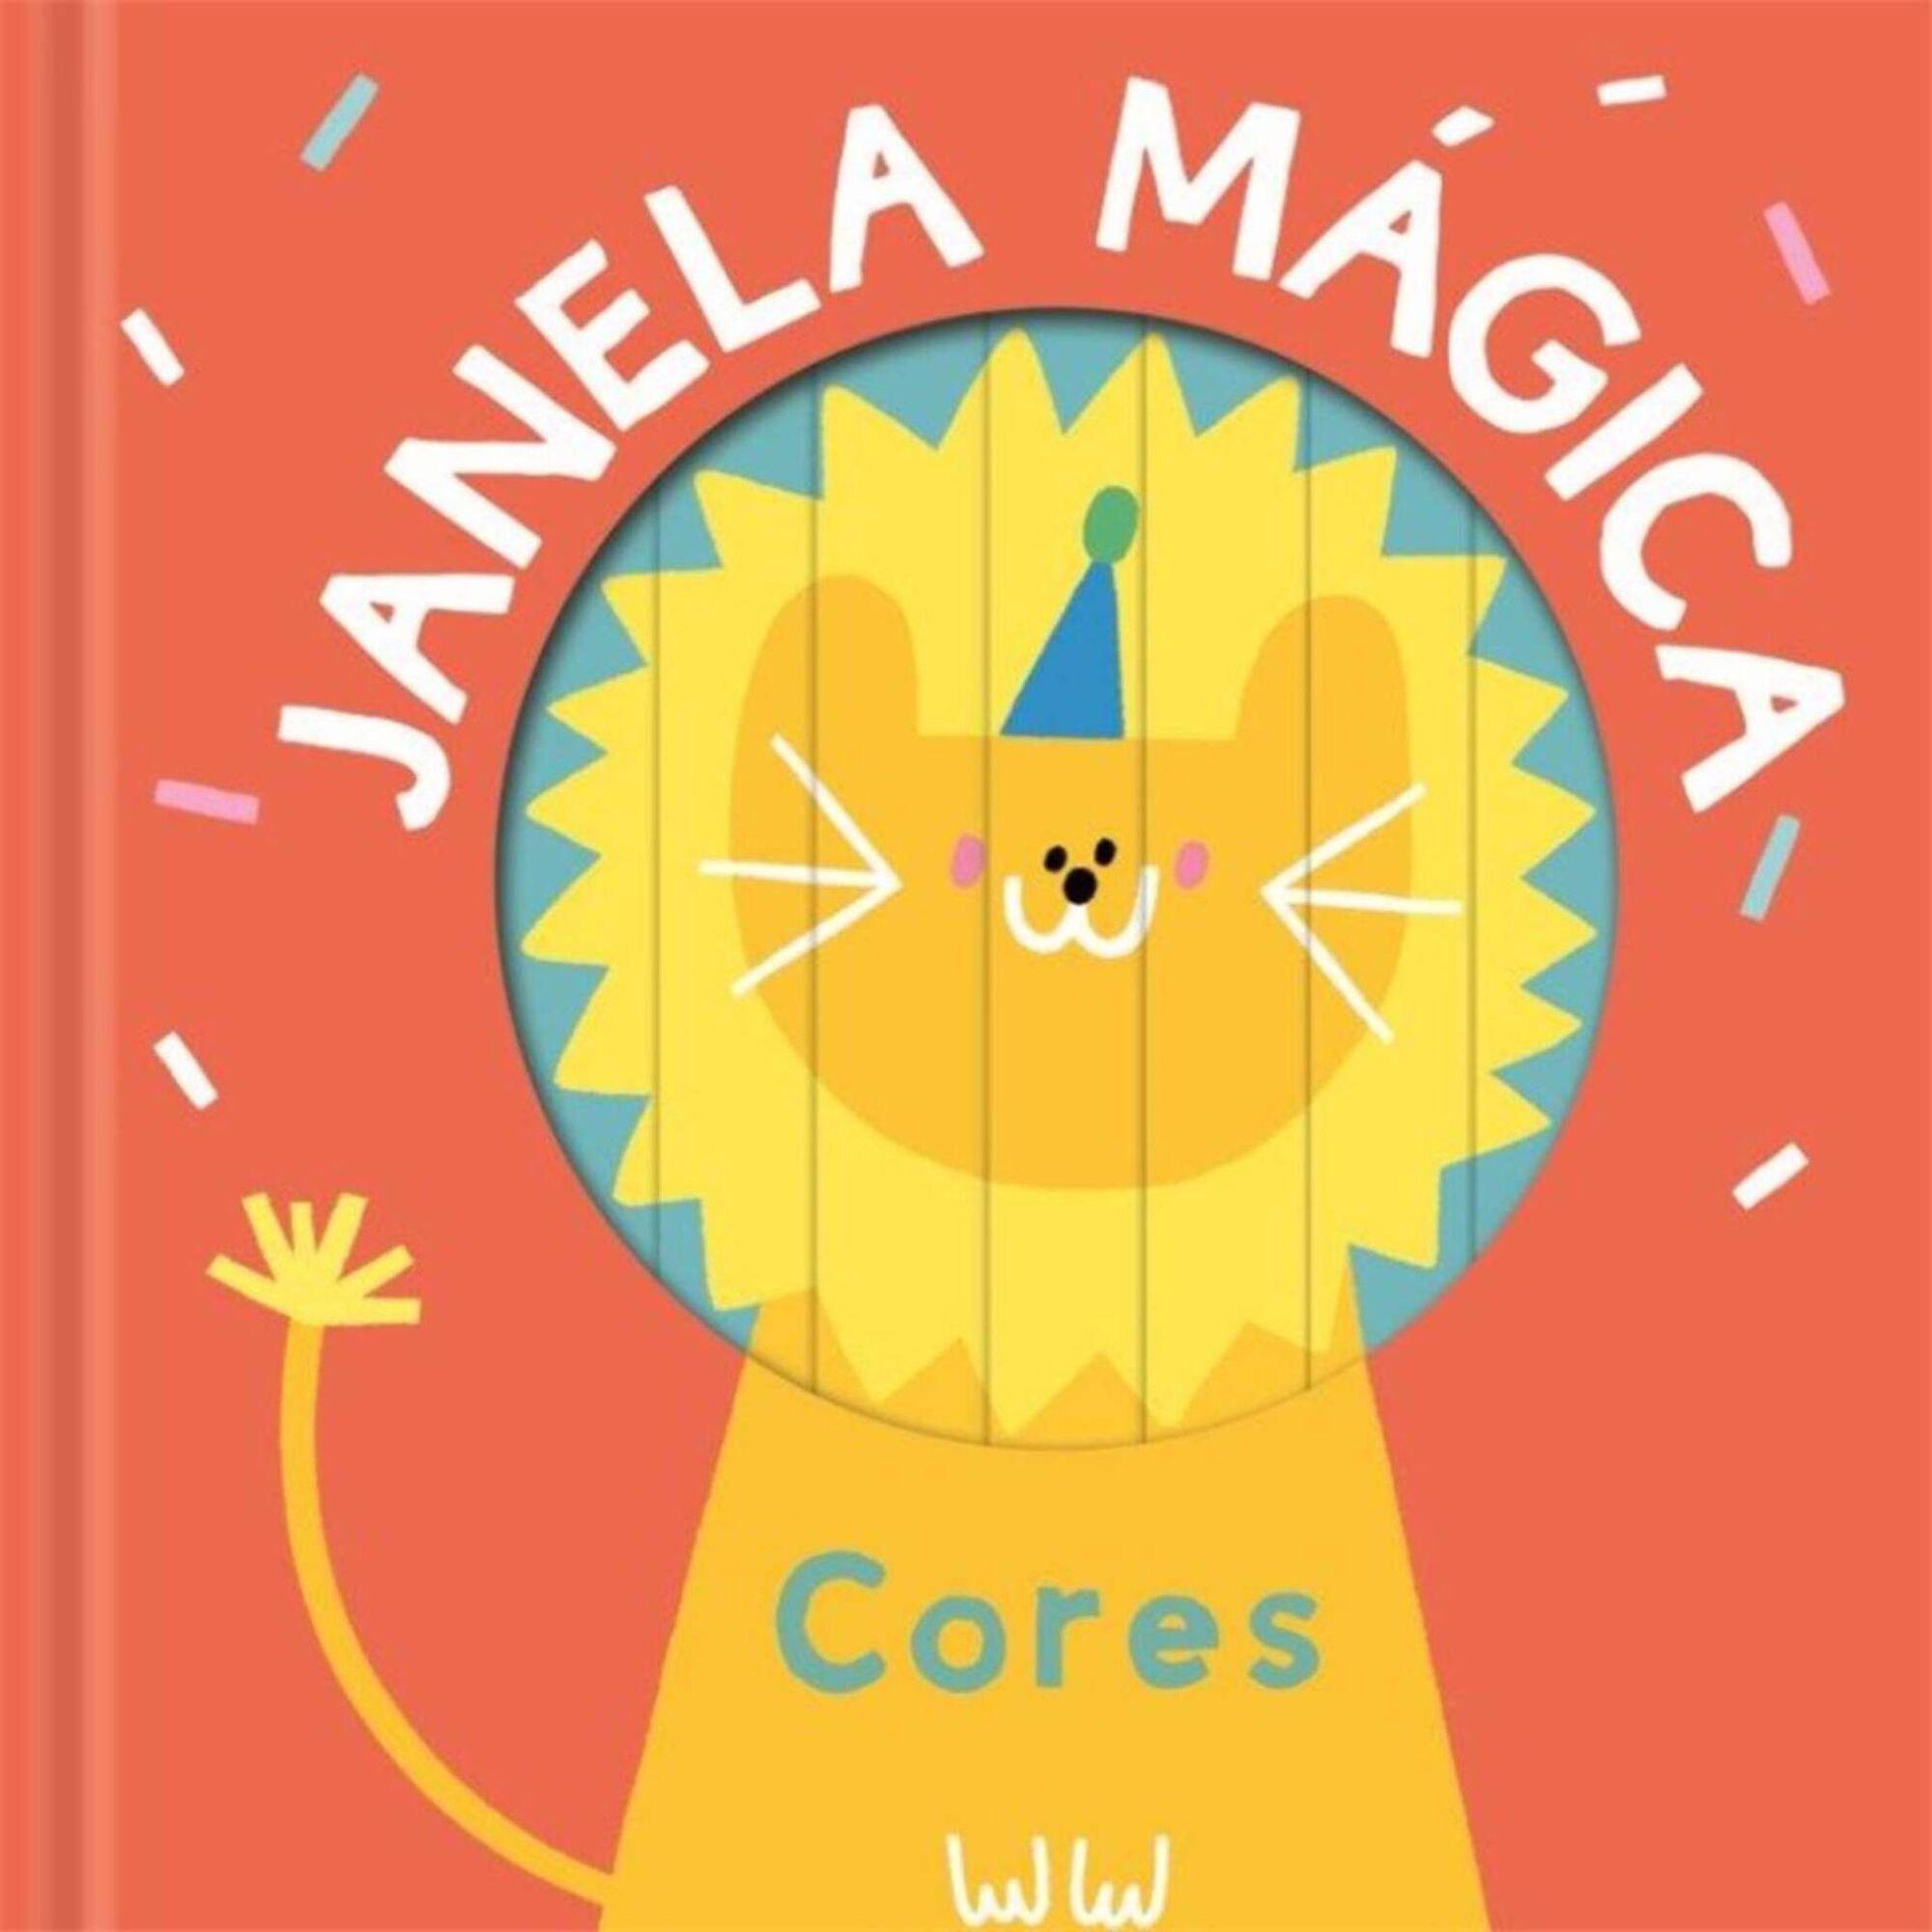 Cores - Janela Mágica